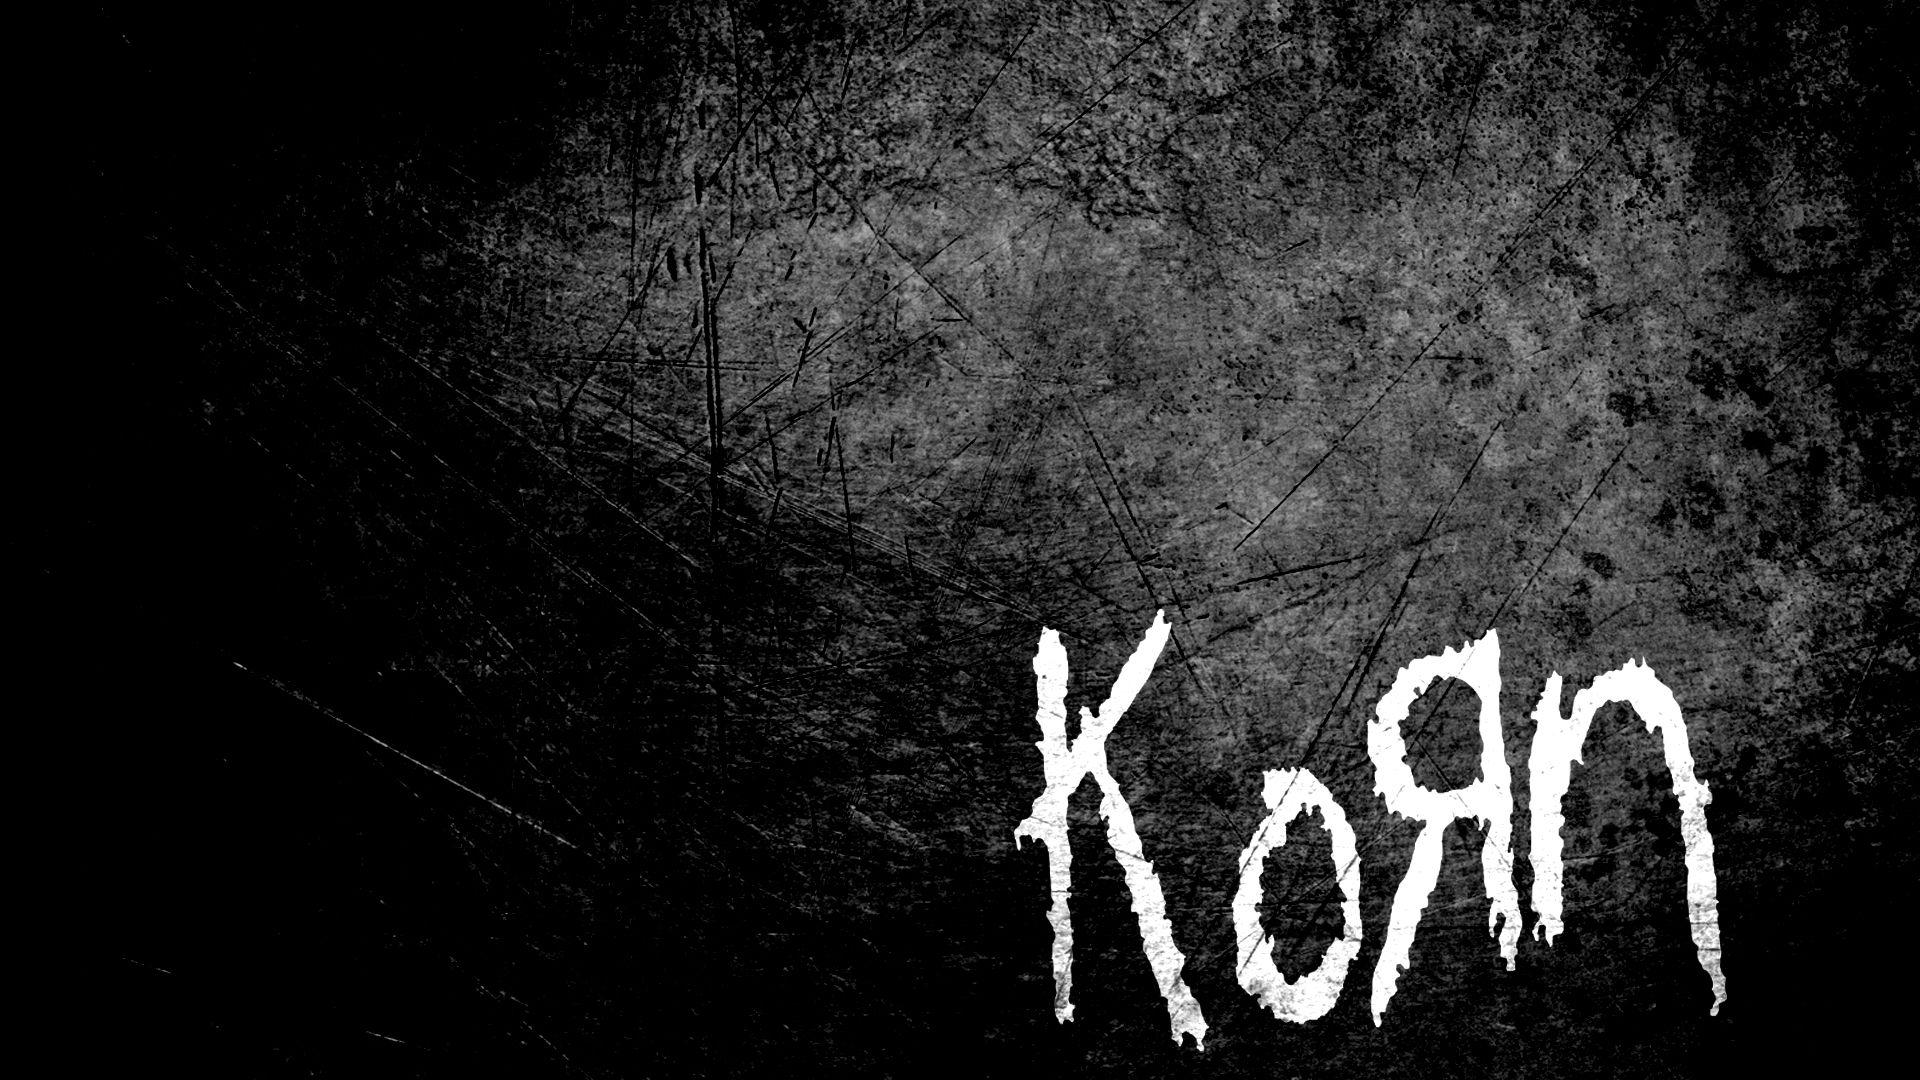 Korn Backgrounds Korn Rock Music Lyrics Music Wallpaper